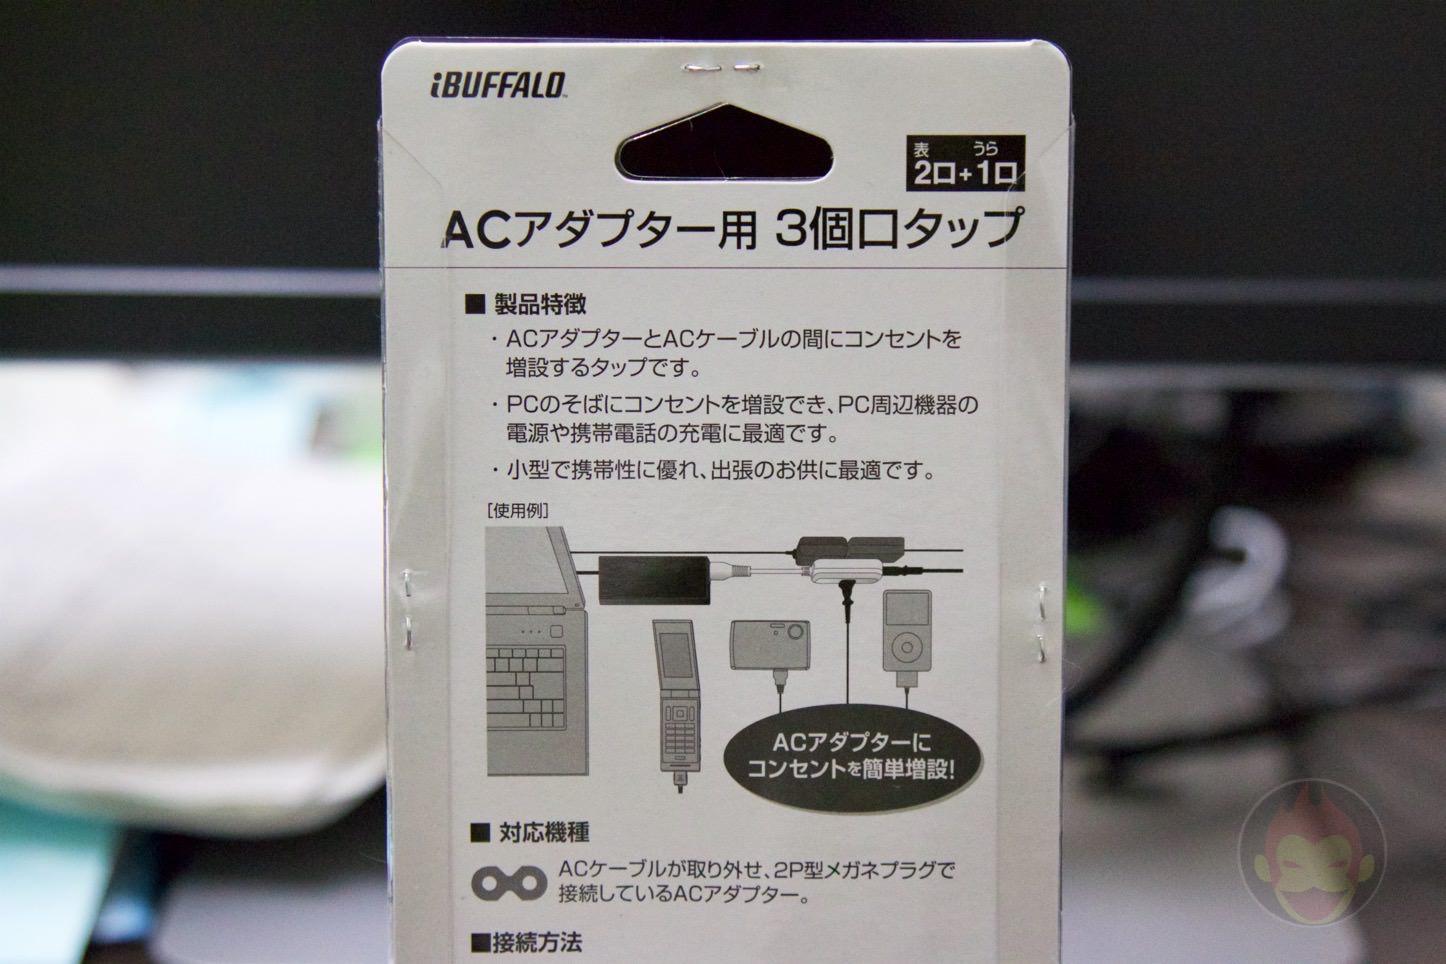 iBUFFALO-AC-Adapter-02.jpg